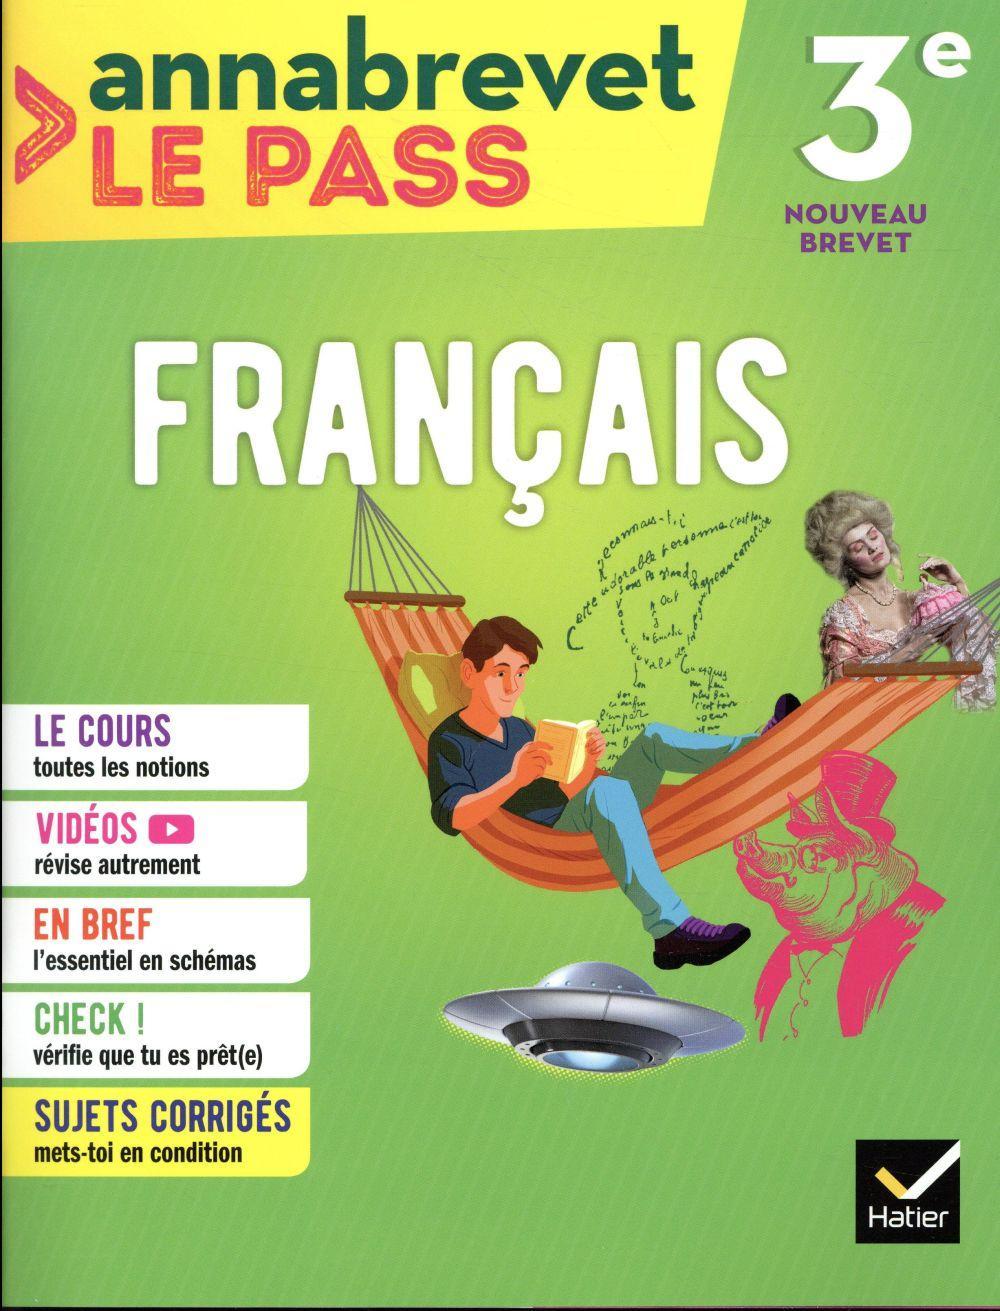 Annabrevet Le Pass Francais 3e Edition 2018 Formond